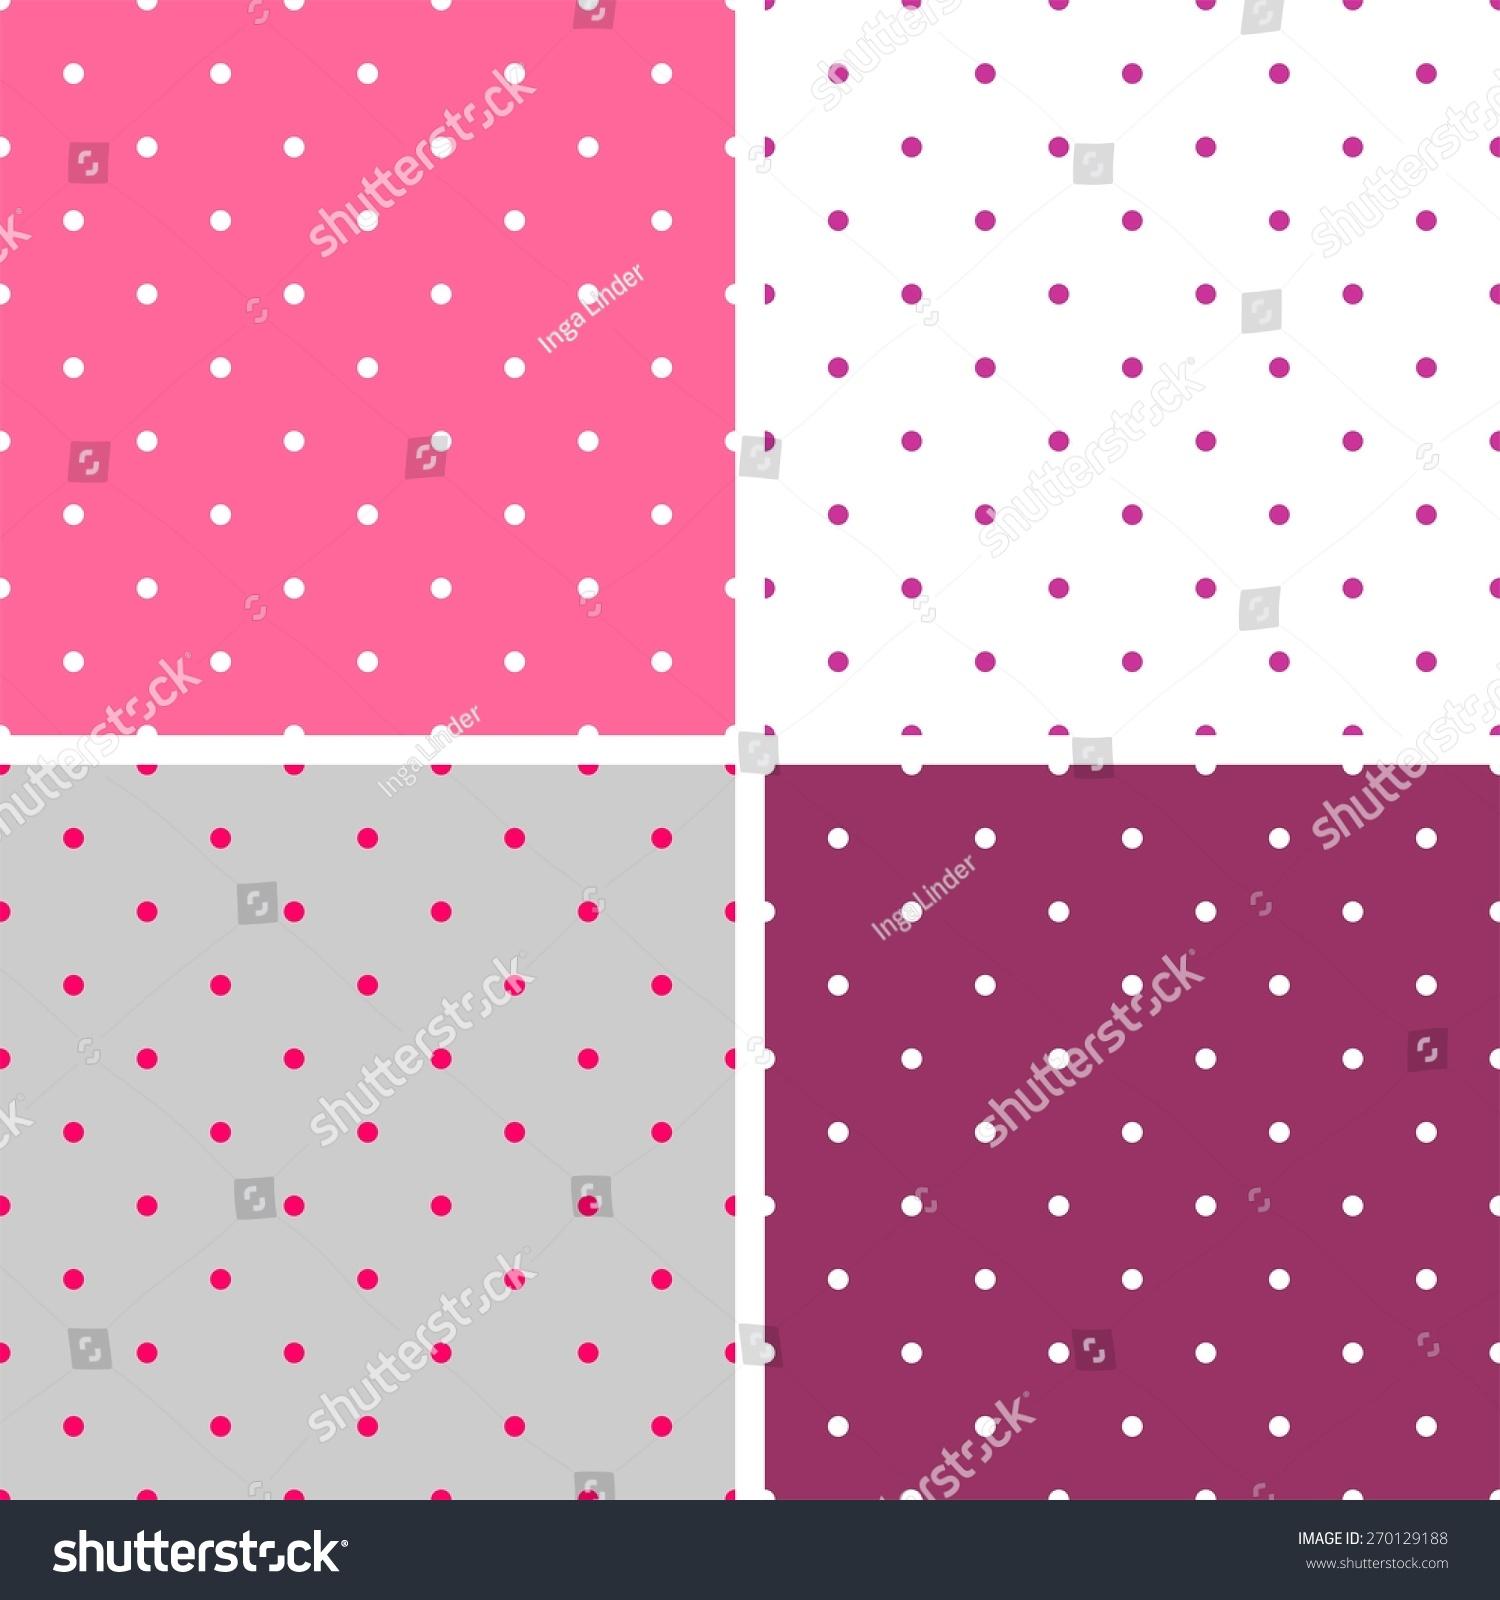 Royalty Free Stock Illustration of Tile Pattern Set Polka Dots Od